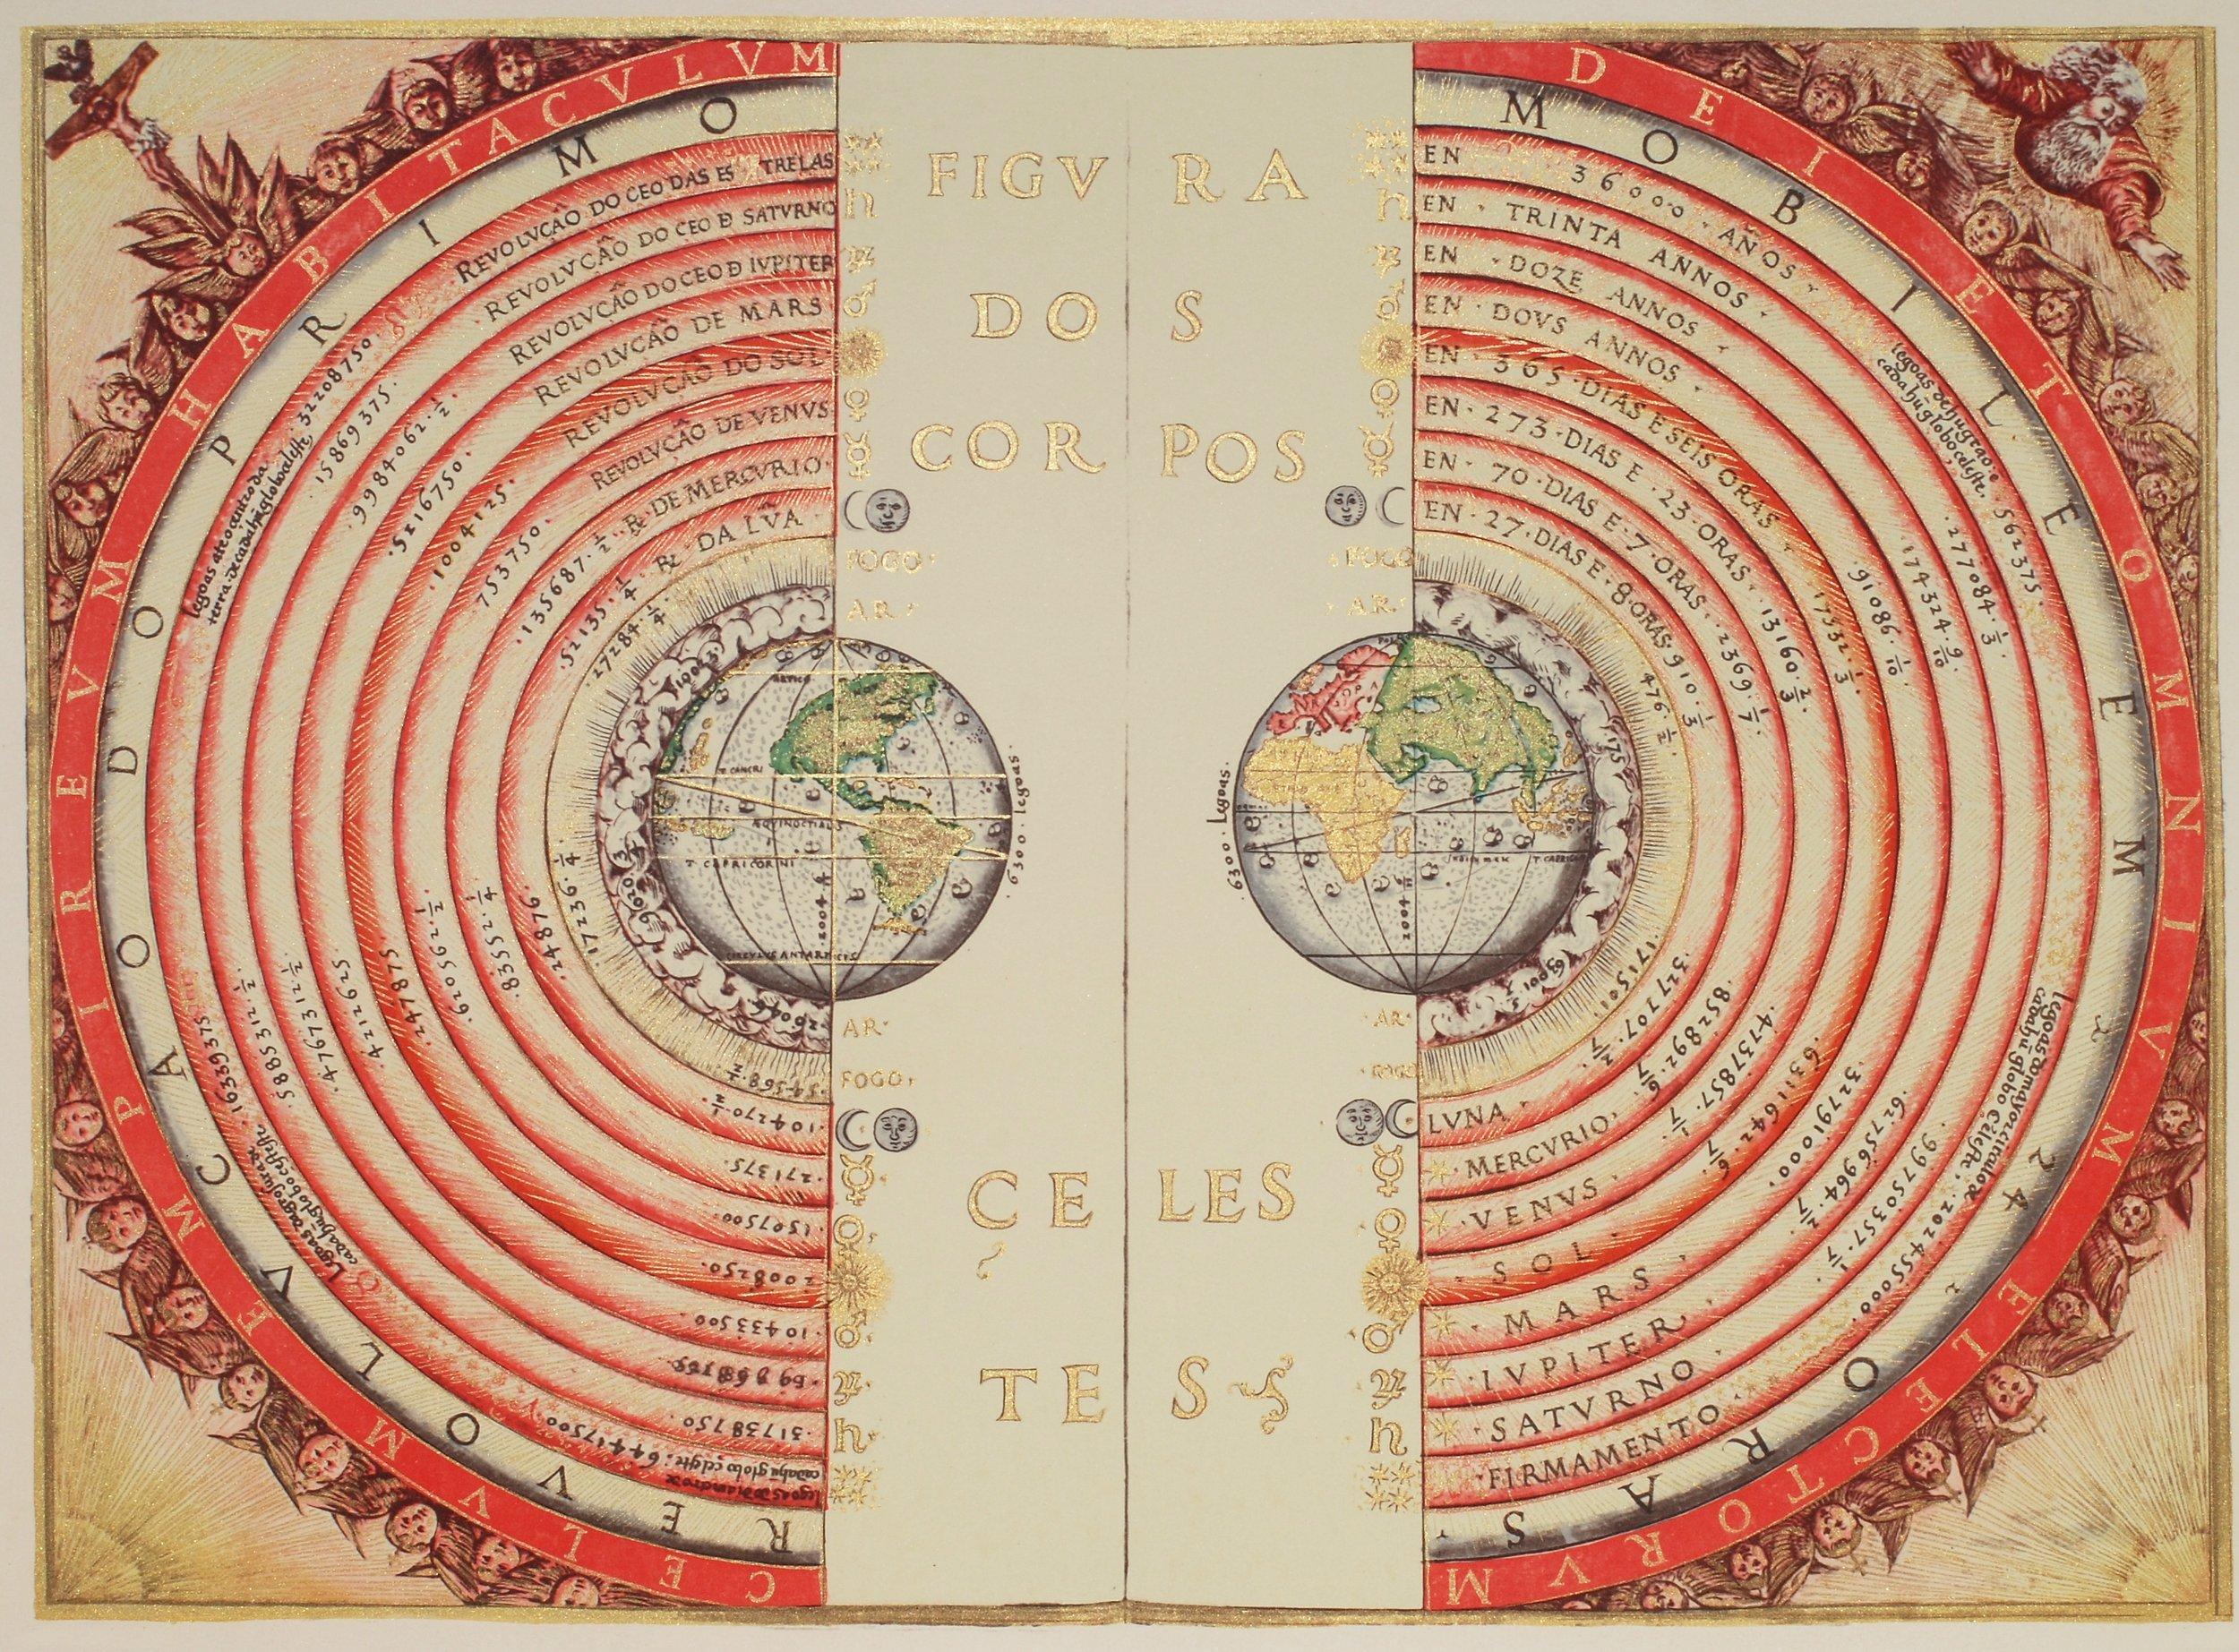 Illustration of the Ptolemaic Geocentric Model of the Universe by Bartolomeu Velho